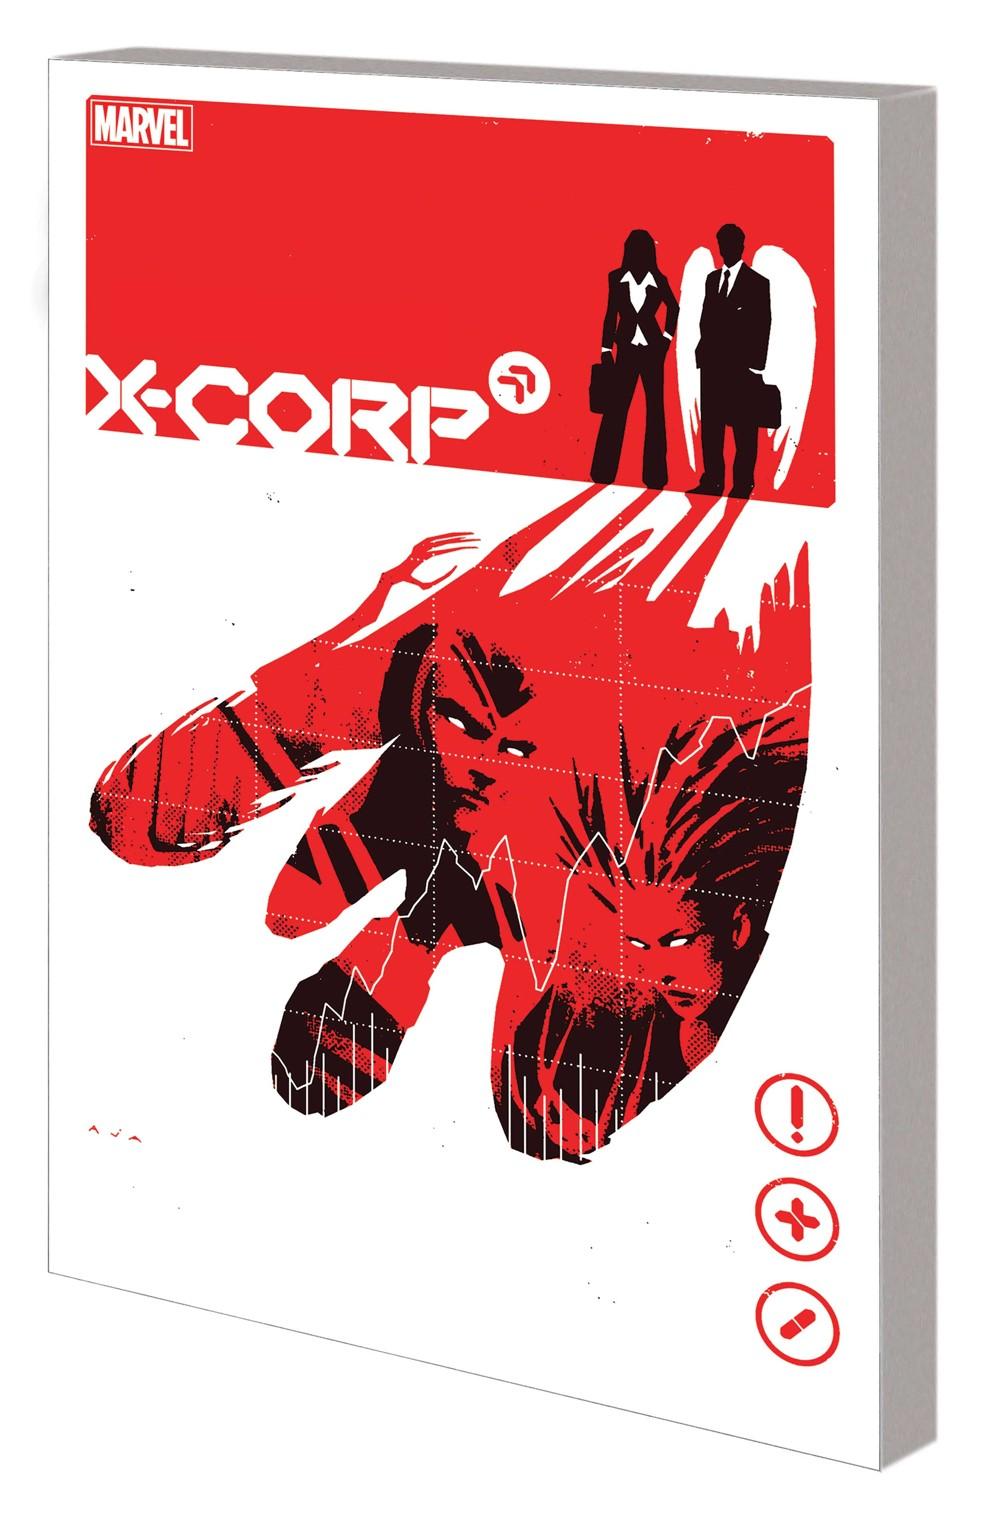 XCORP_VOL_1_TPB Marvel Comics September 2021 Solicitations